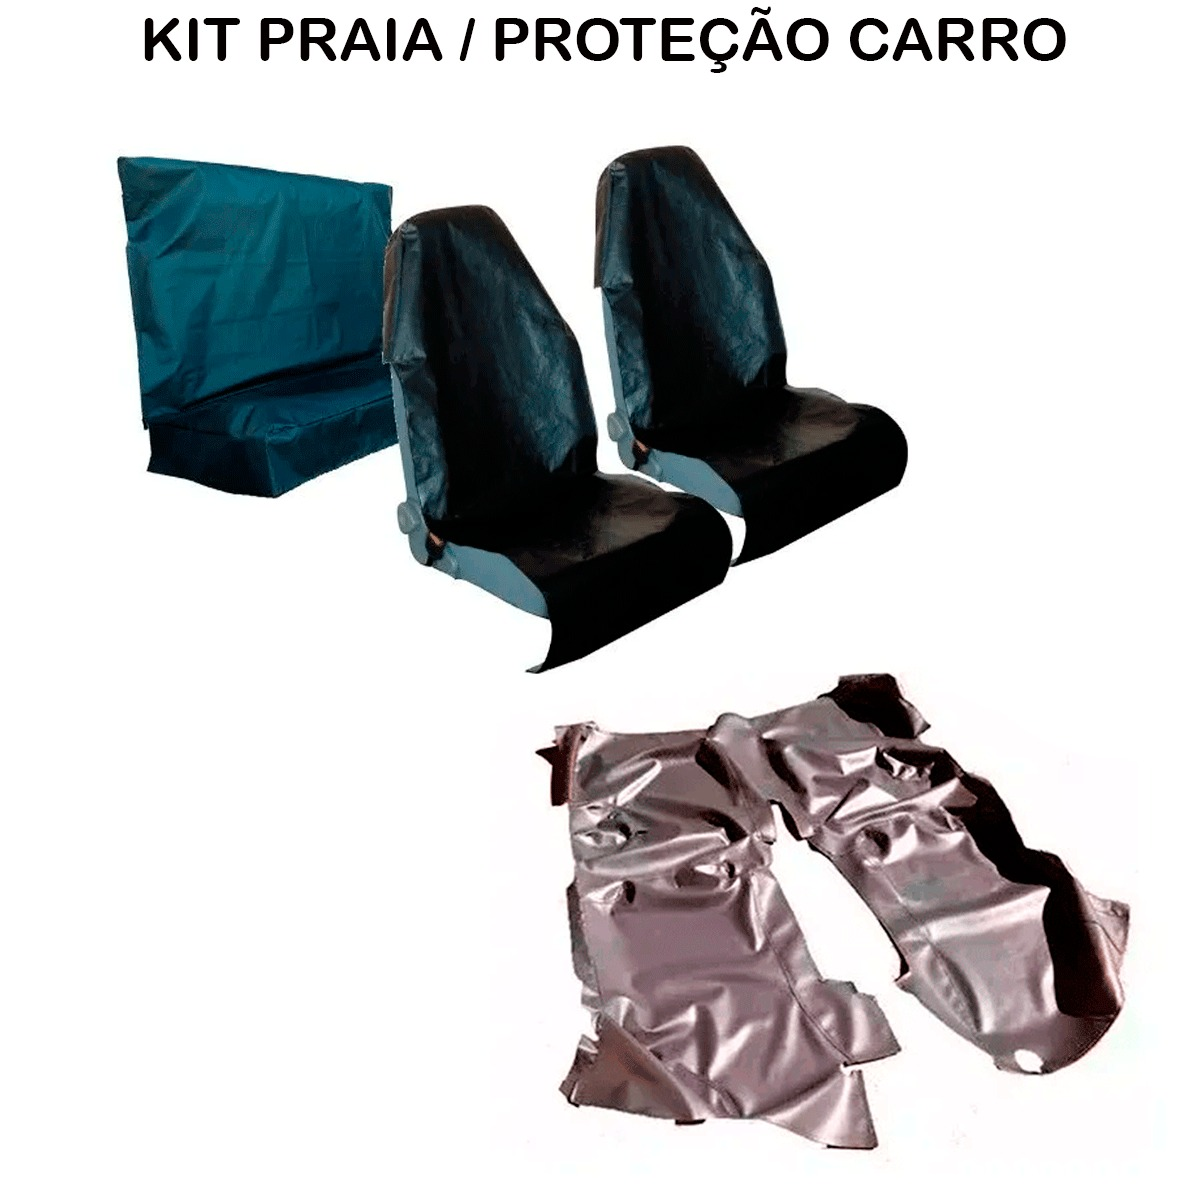 Tapete Em Vinil Ford Focus 2014 a 2019 + Capa Banco Protecao Banco Areia Suor Academia